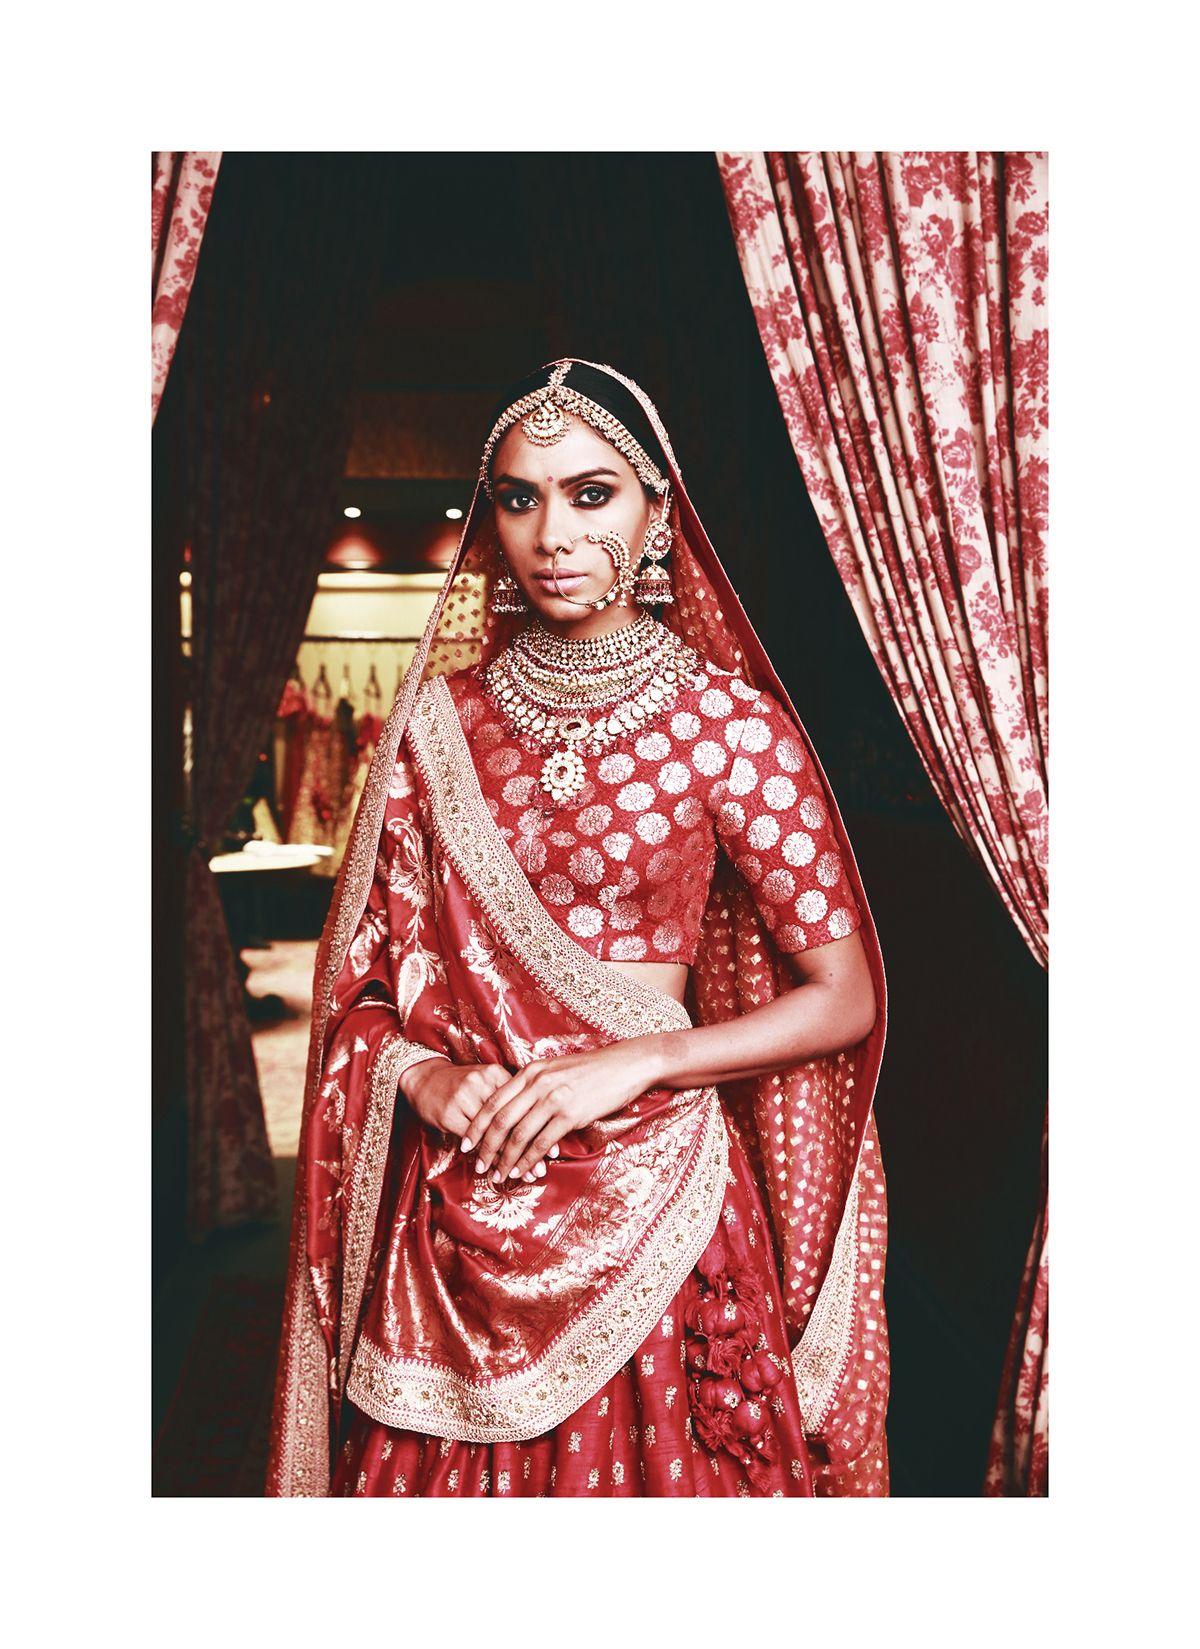 Stunning bridal | Royalty Indian Wedding | Pinterest